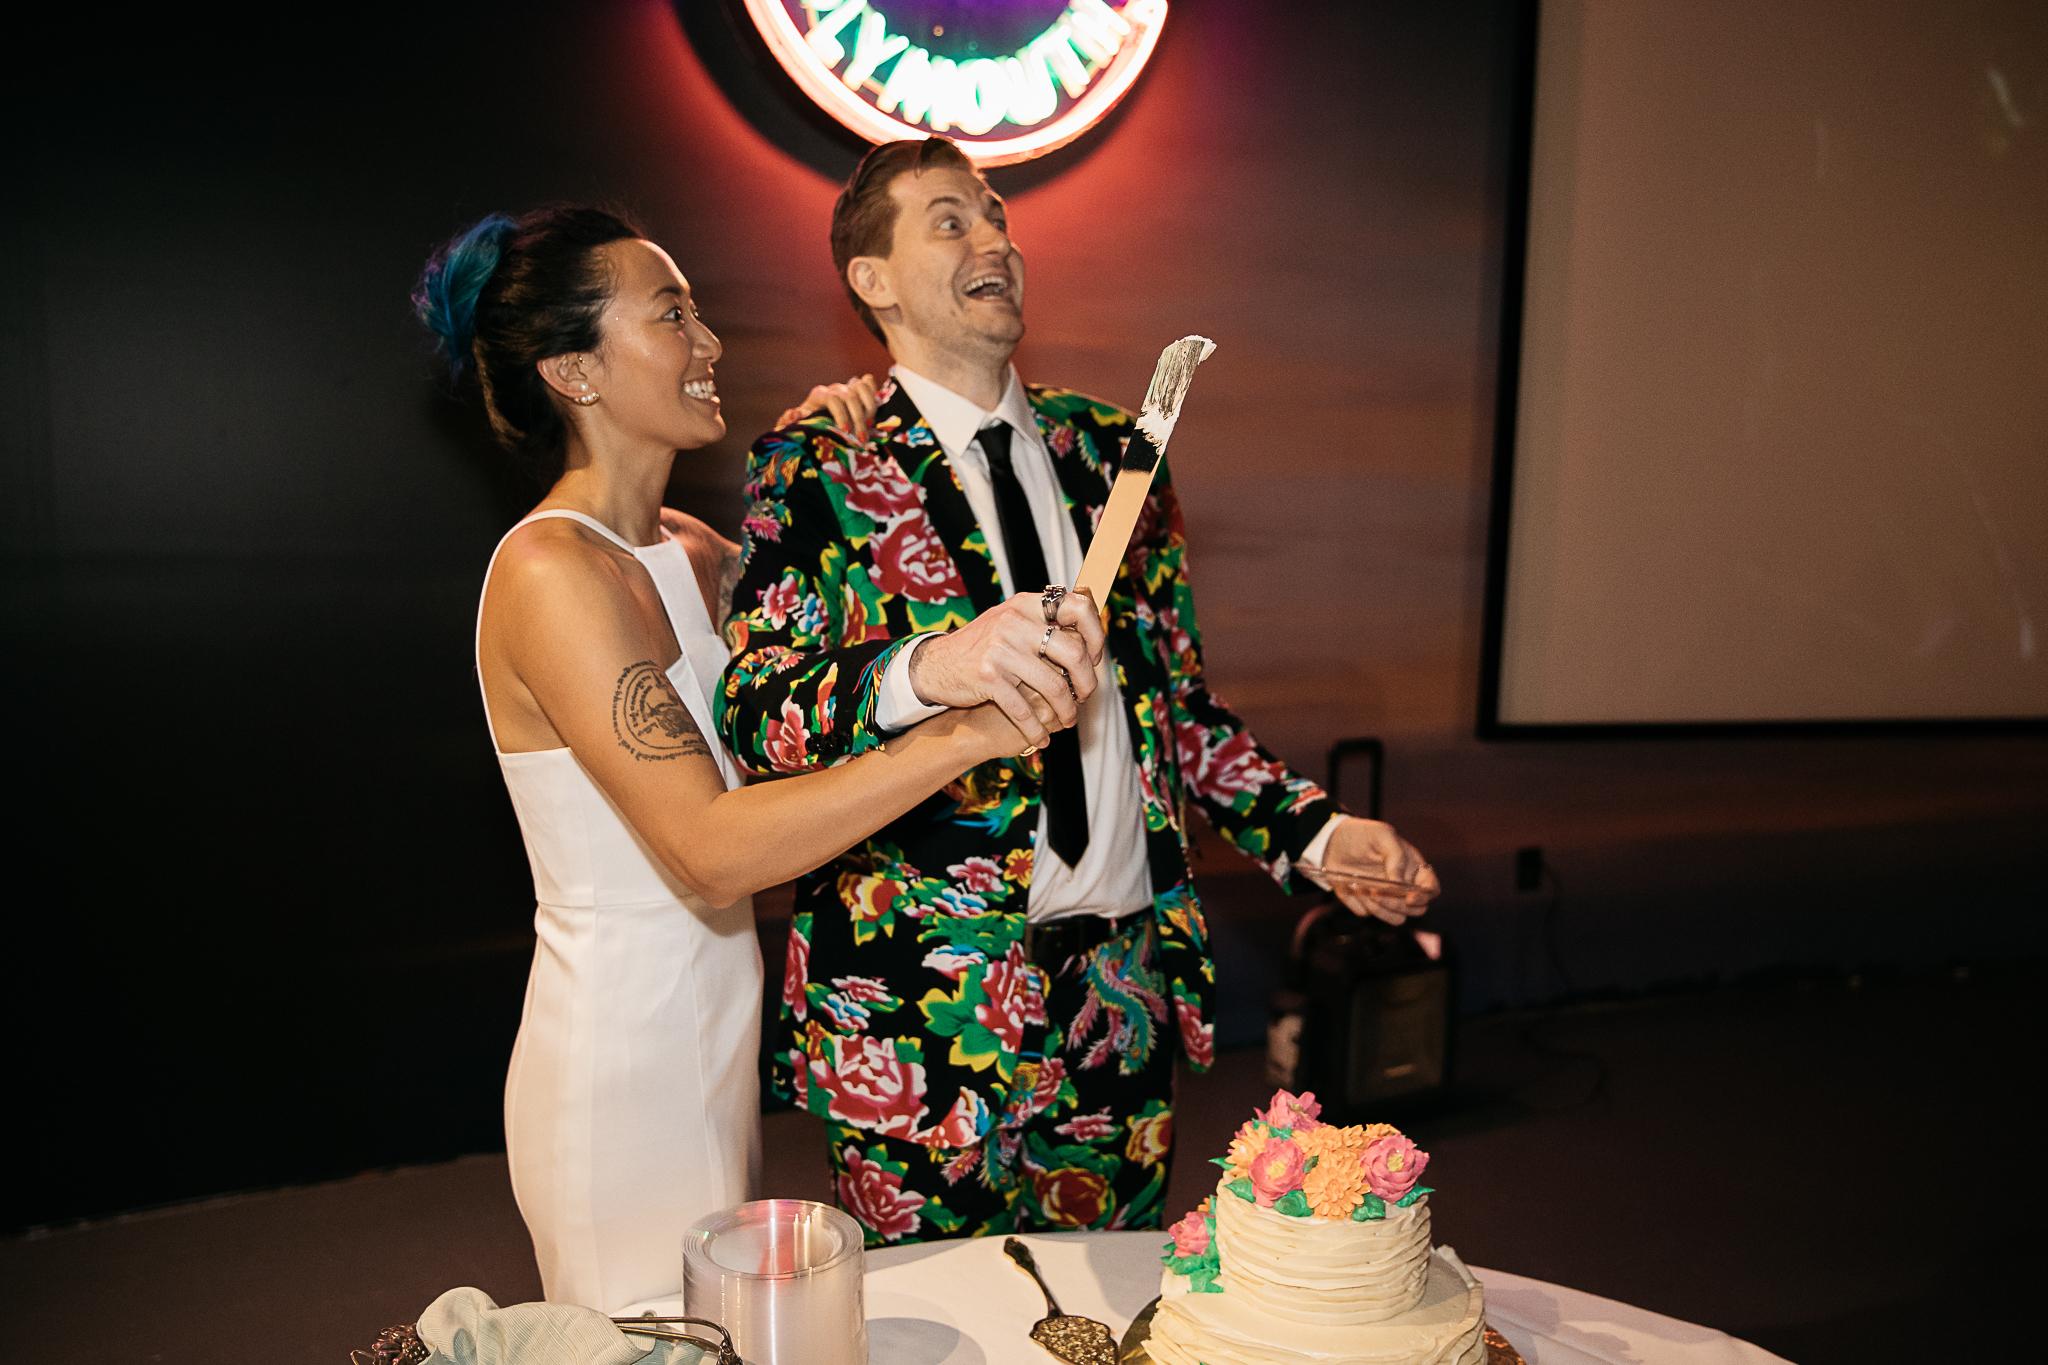 graceland-wedding-memphis-wedding-photographers-beryl-sean-6612.jpg